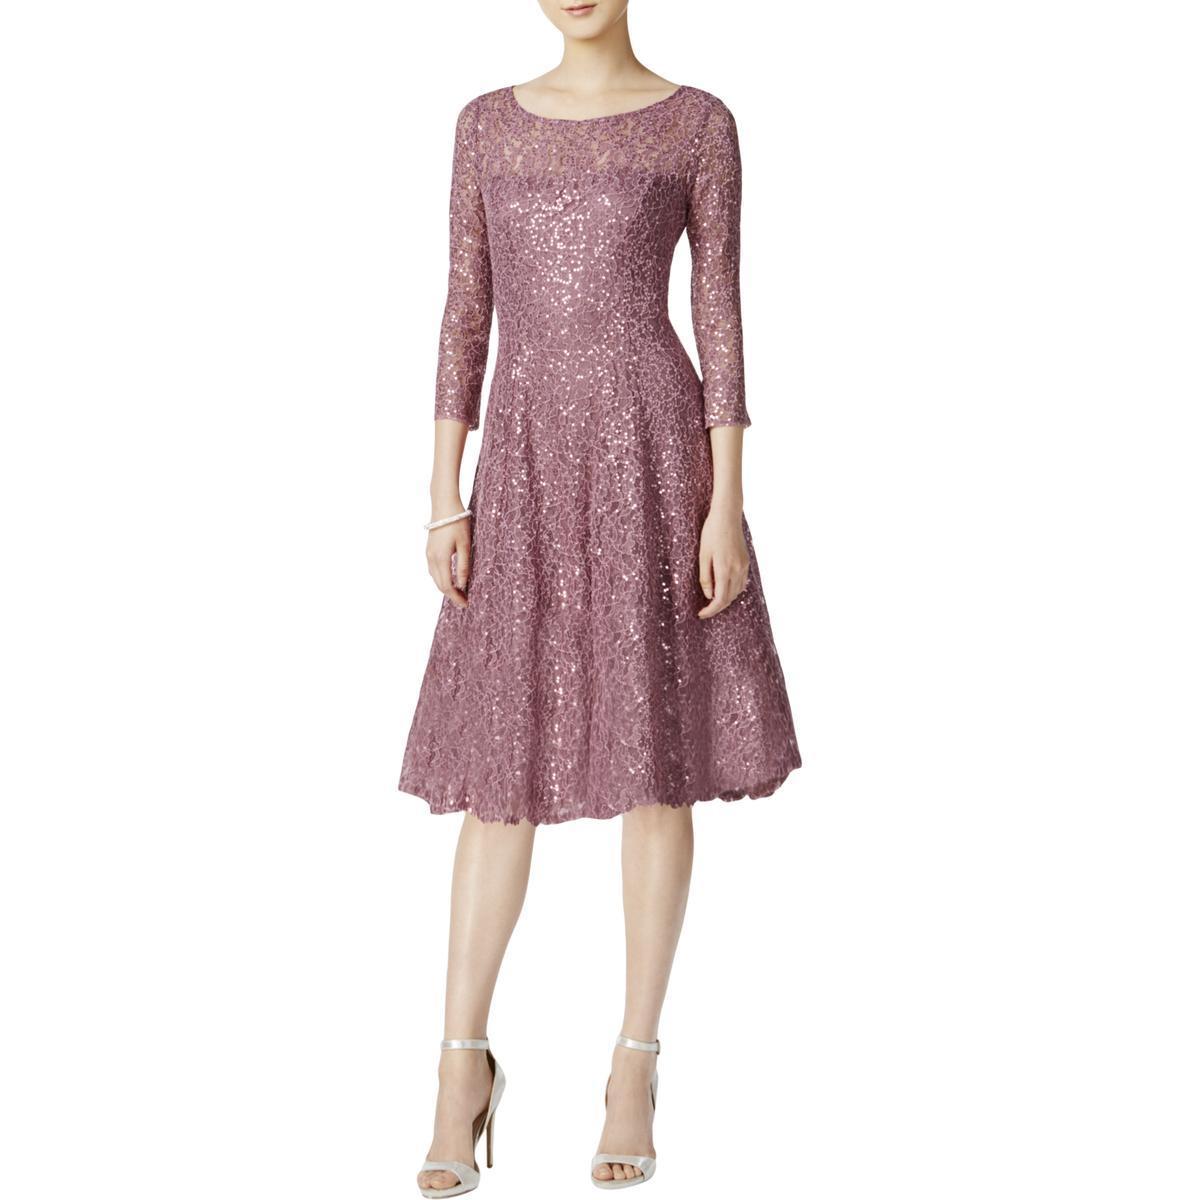 Birthday Dress For Womens: SLNY Womens Lace Mini Special Occasion Party Dress BHFO